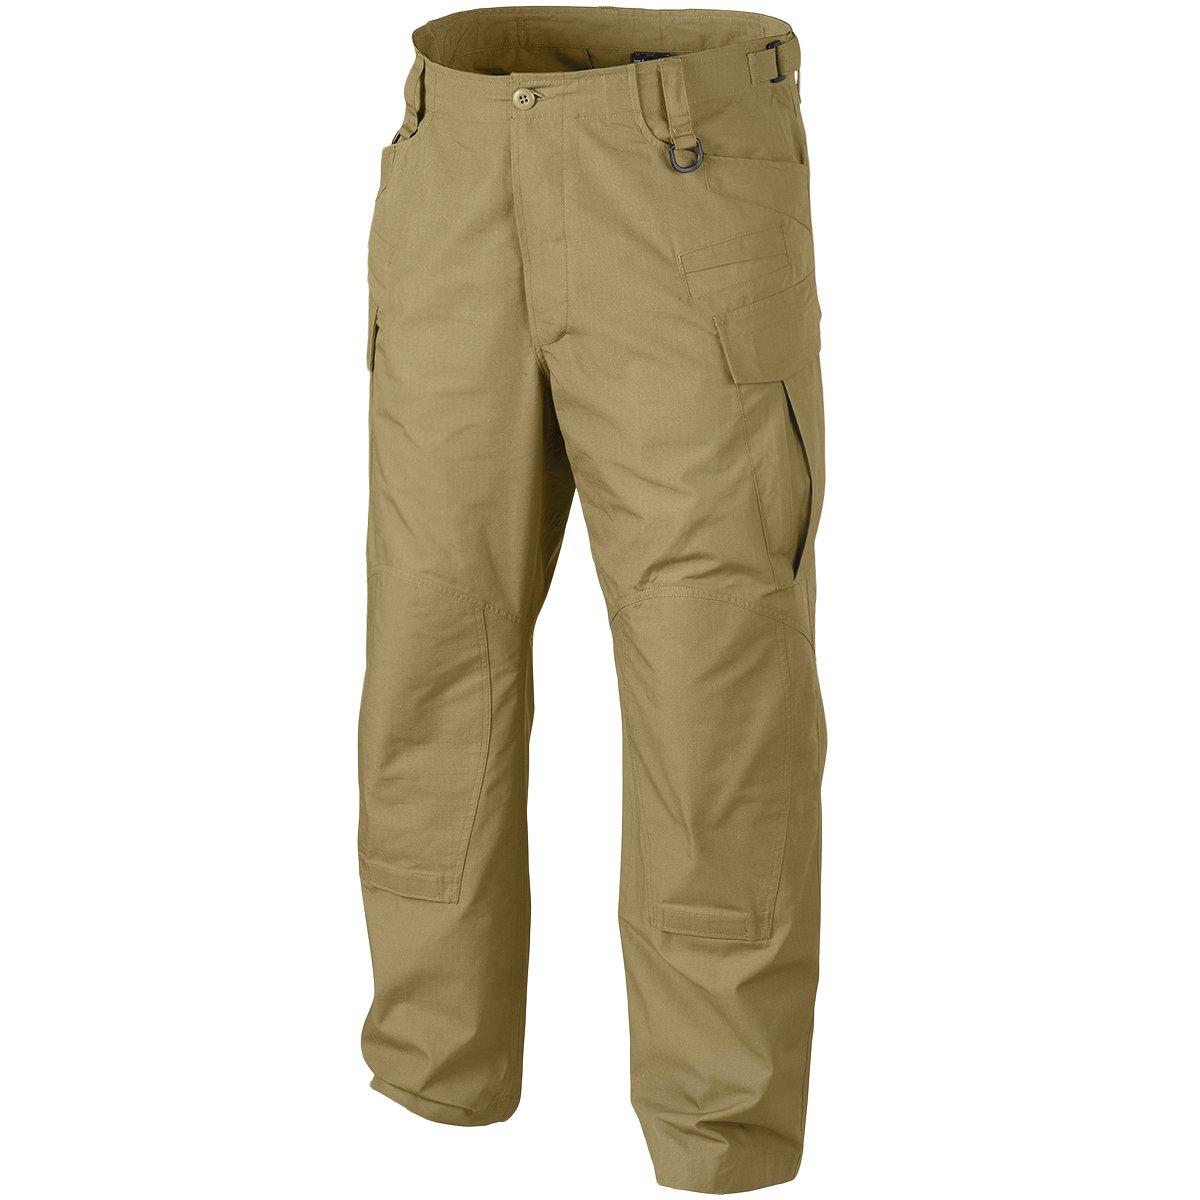 Helikon SFU NEXT Hombres Pantalones Polialgodón Ripstop Coyote tamaño XL Reg